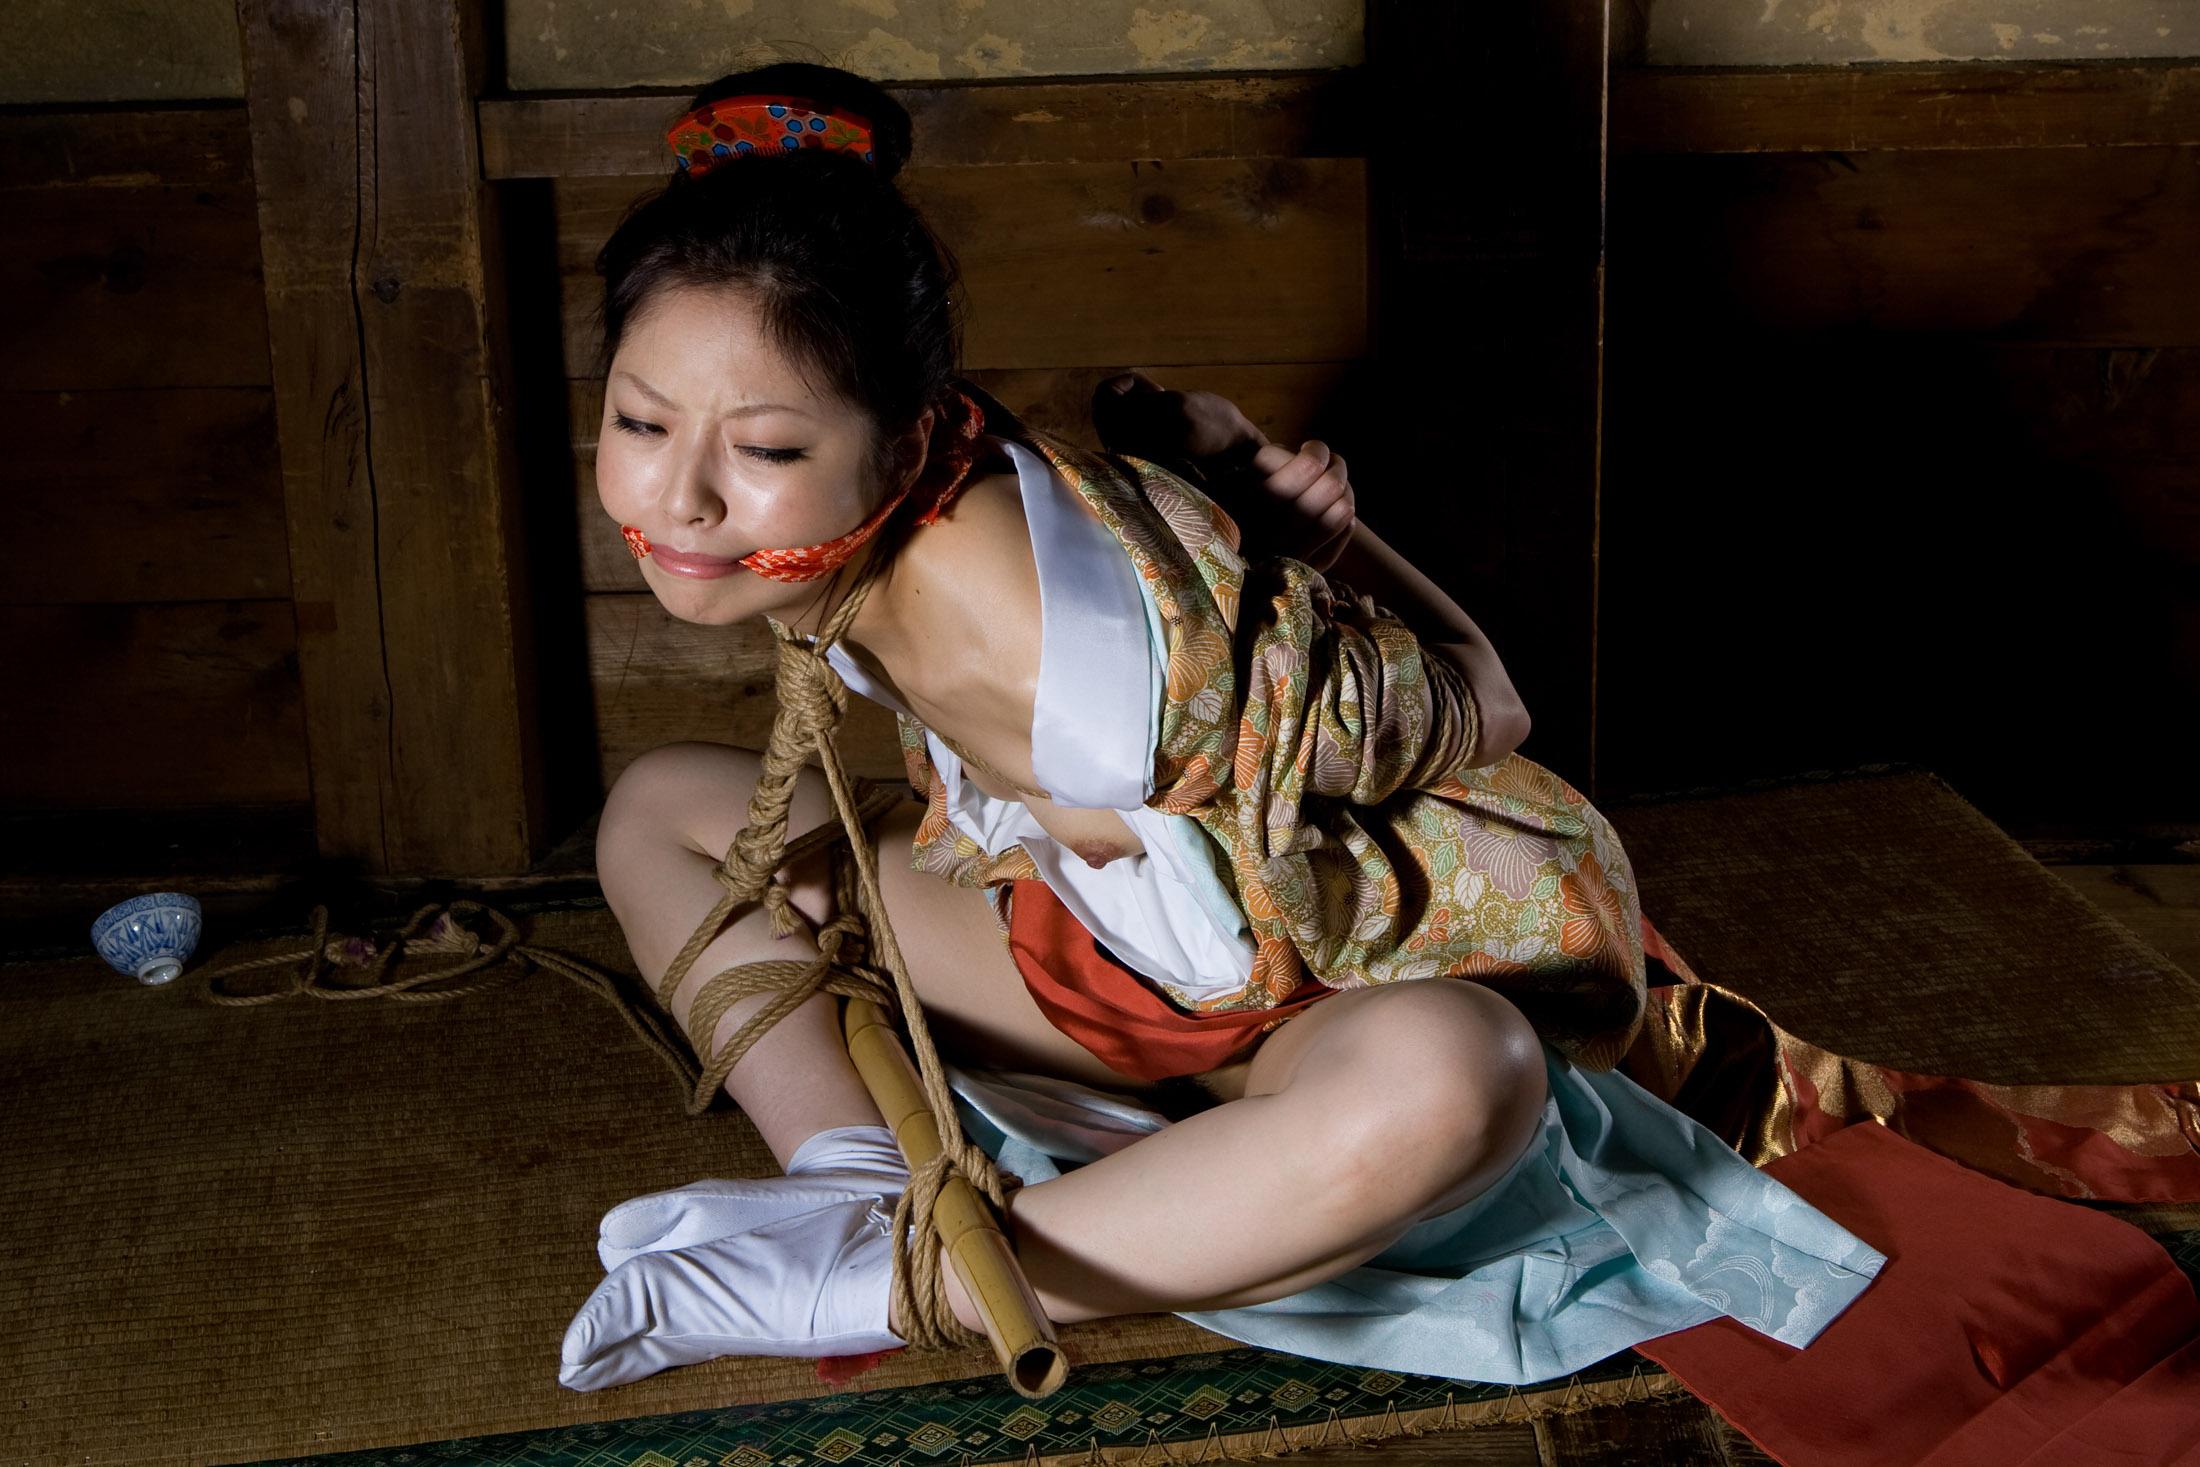 Unraveling the mysteries of kinbaku, the erotic art of japanese rope bondage